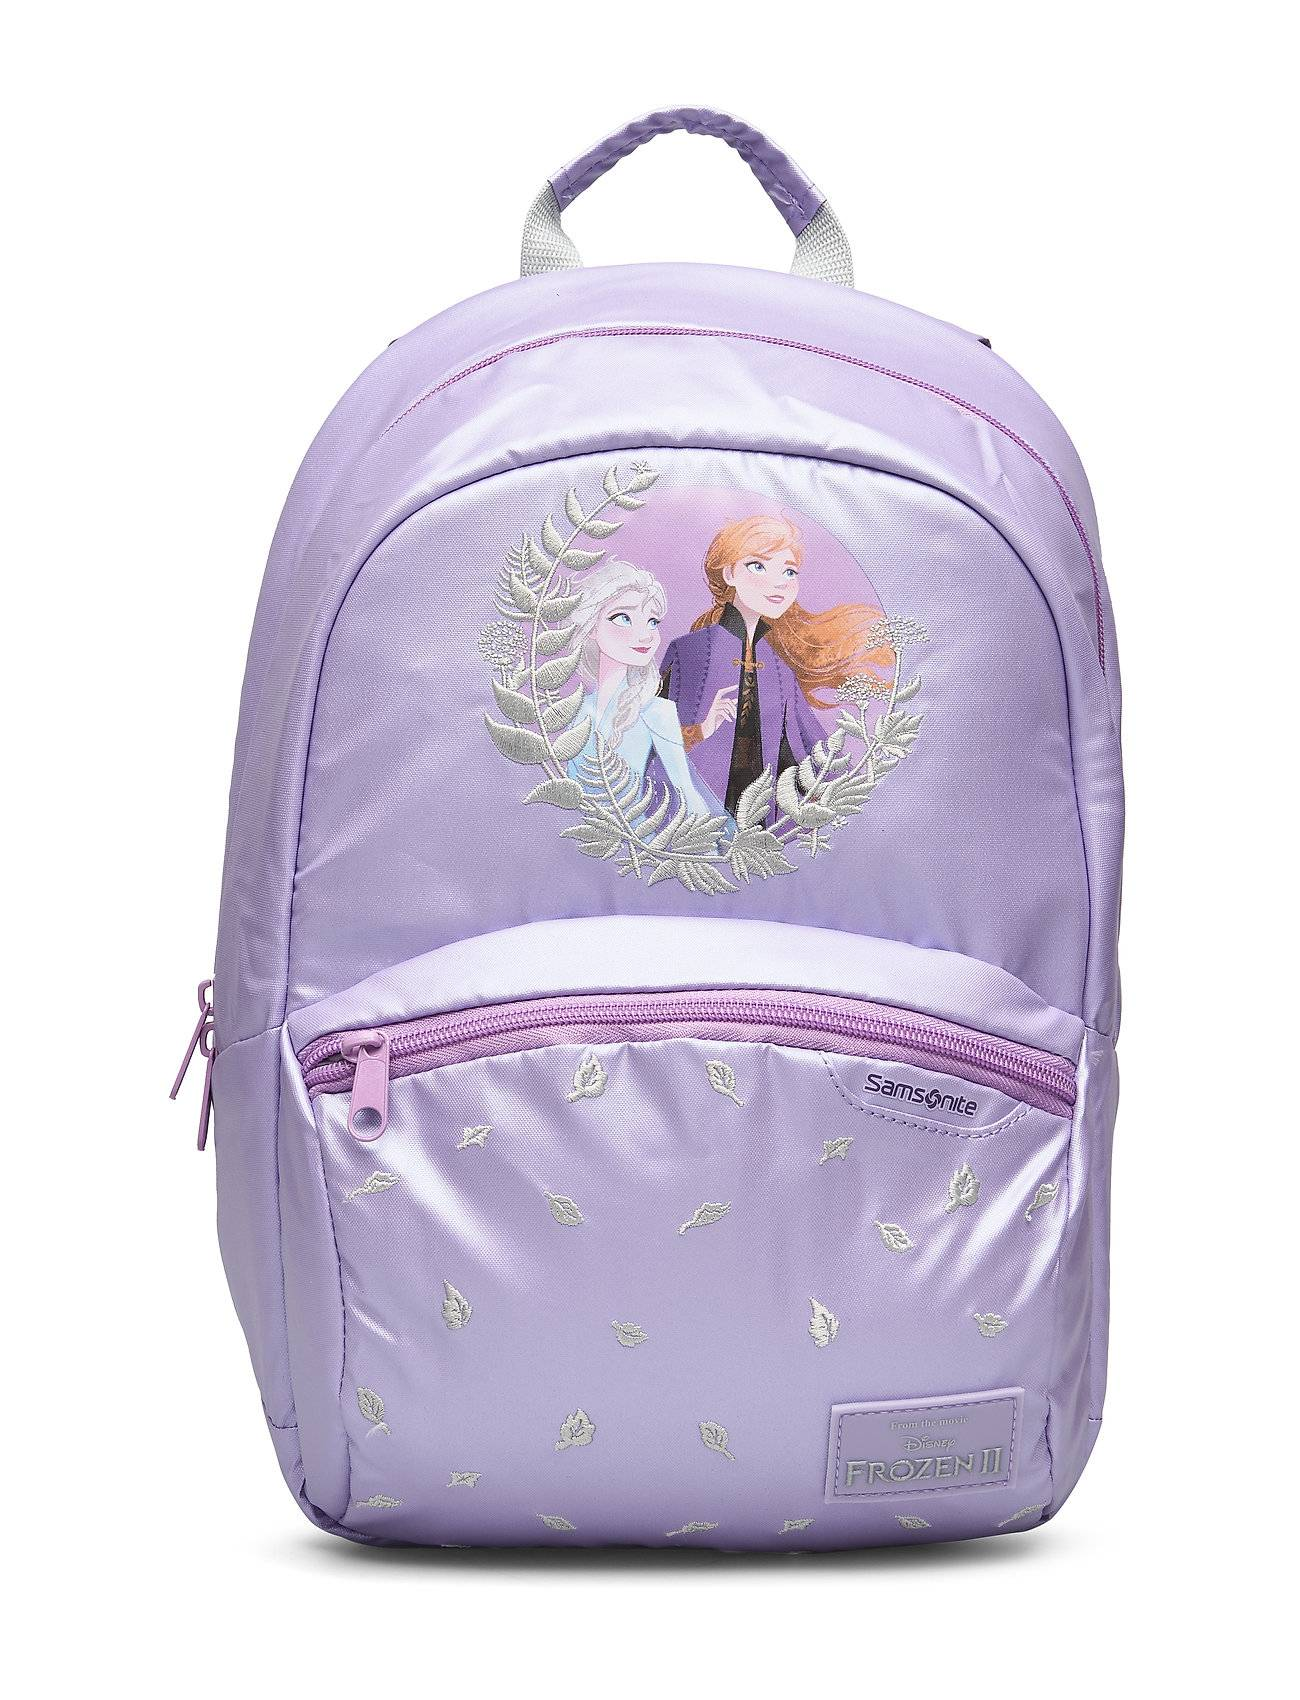 Samsonite Disney Backpack S+ Frozen Ii Accessories Bags Backpacks Liila